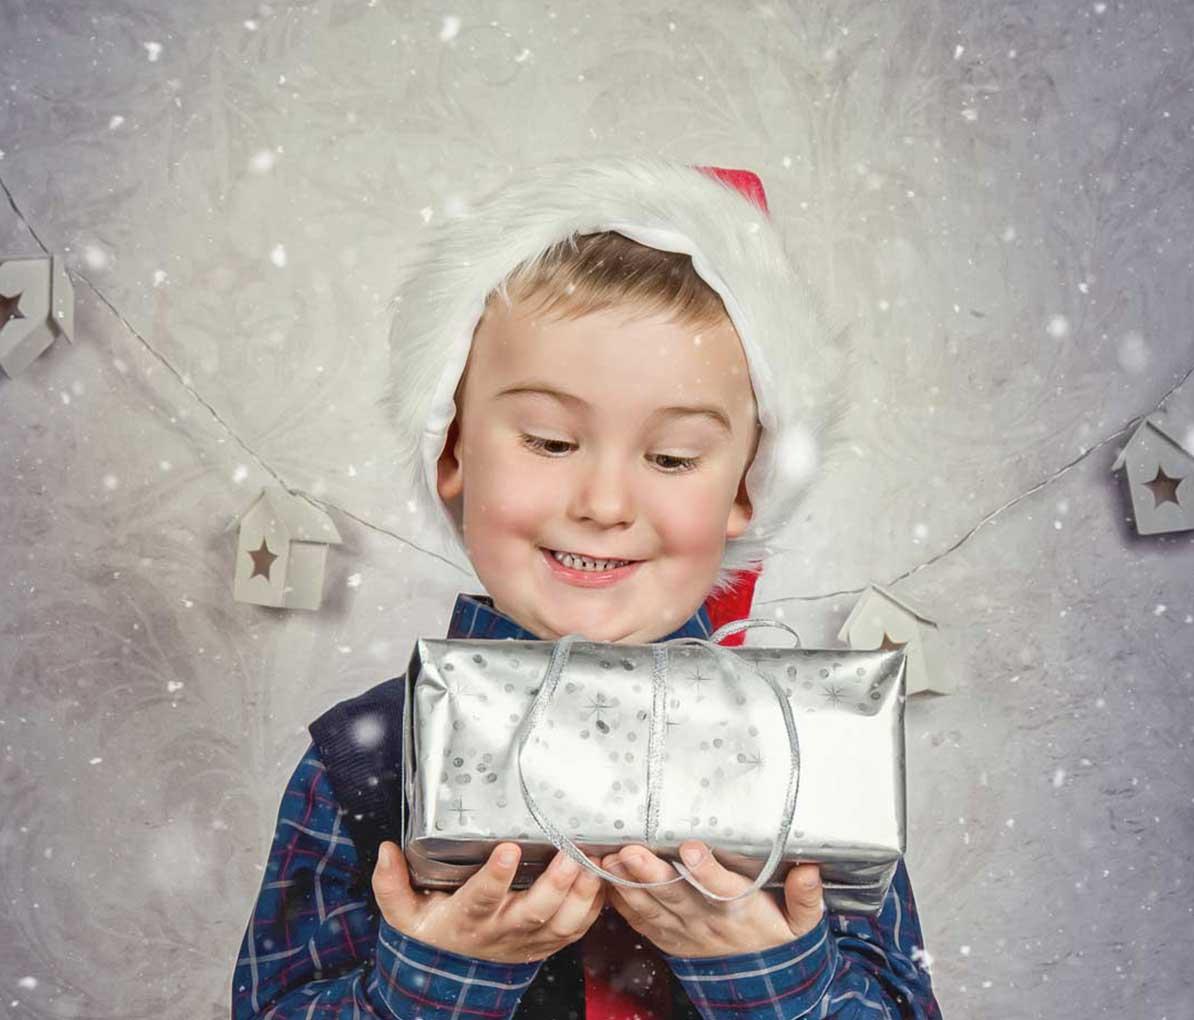 True-Creative-Agency-Familienportraits-8-1